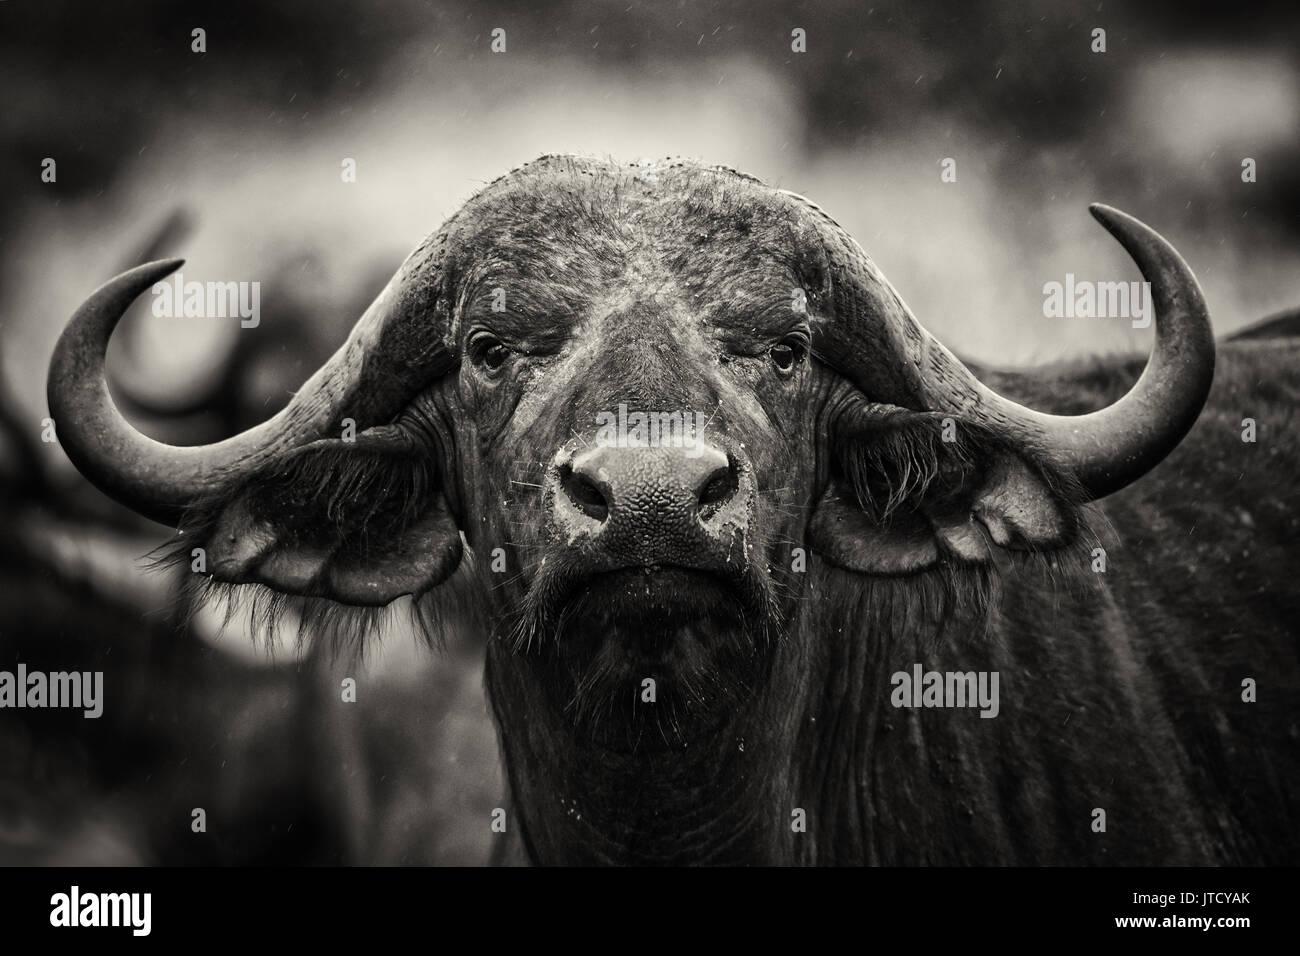 buffalo republic of benin stock photos buffalo republic of benin